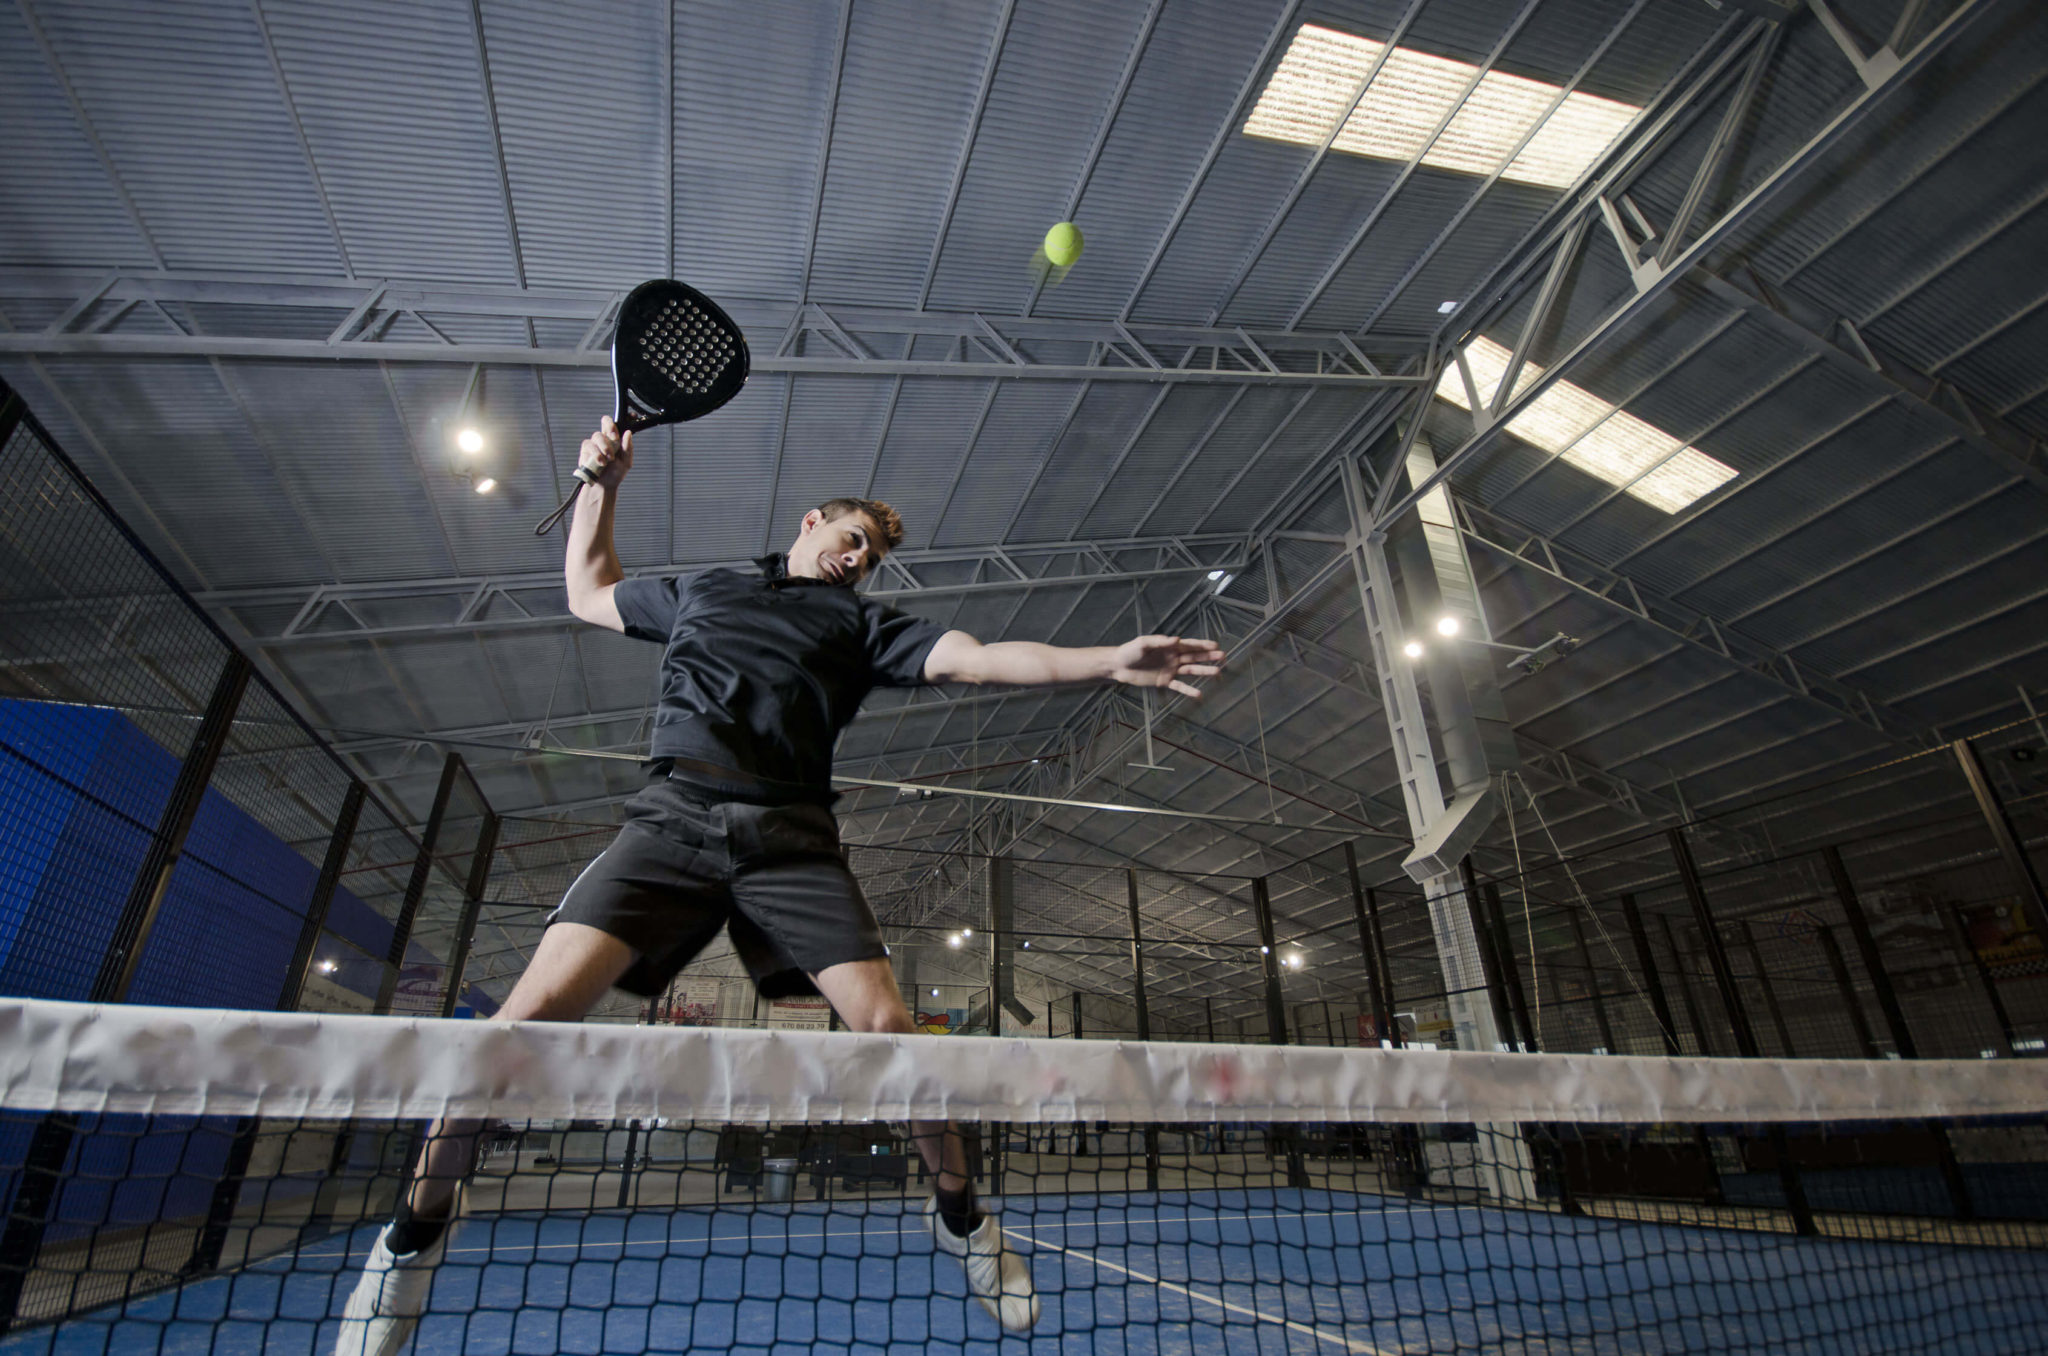 The best rackets in padel 2020